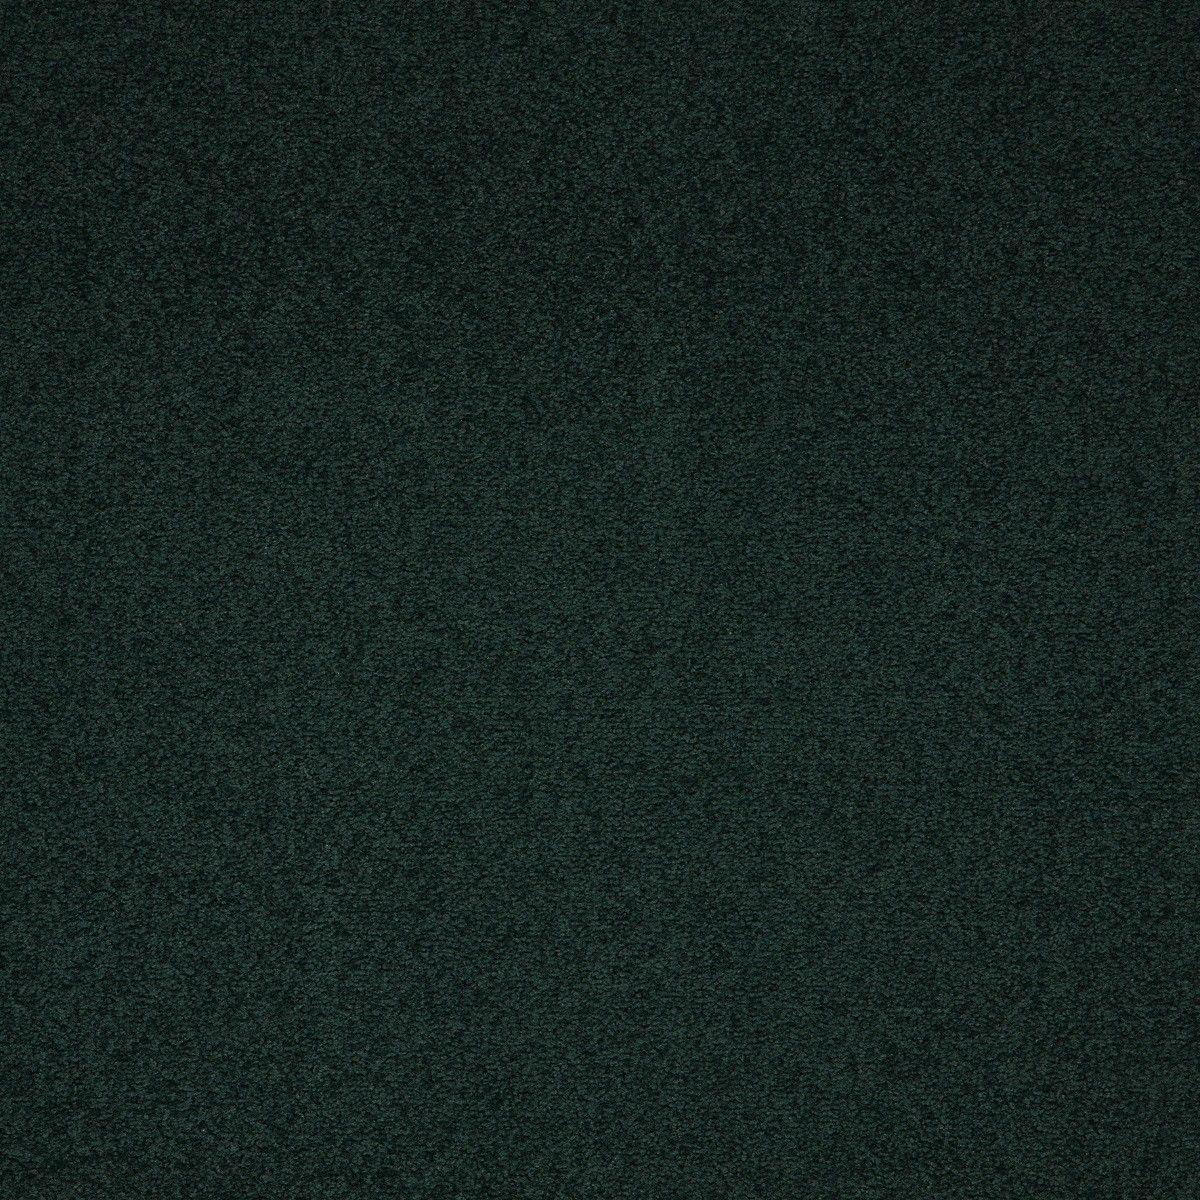 dark green carpet texture. paragon maestro 38 carpet tile colour dark green. green texture p